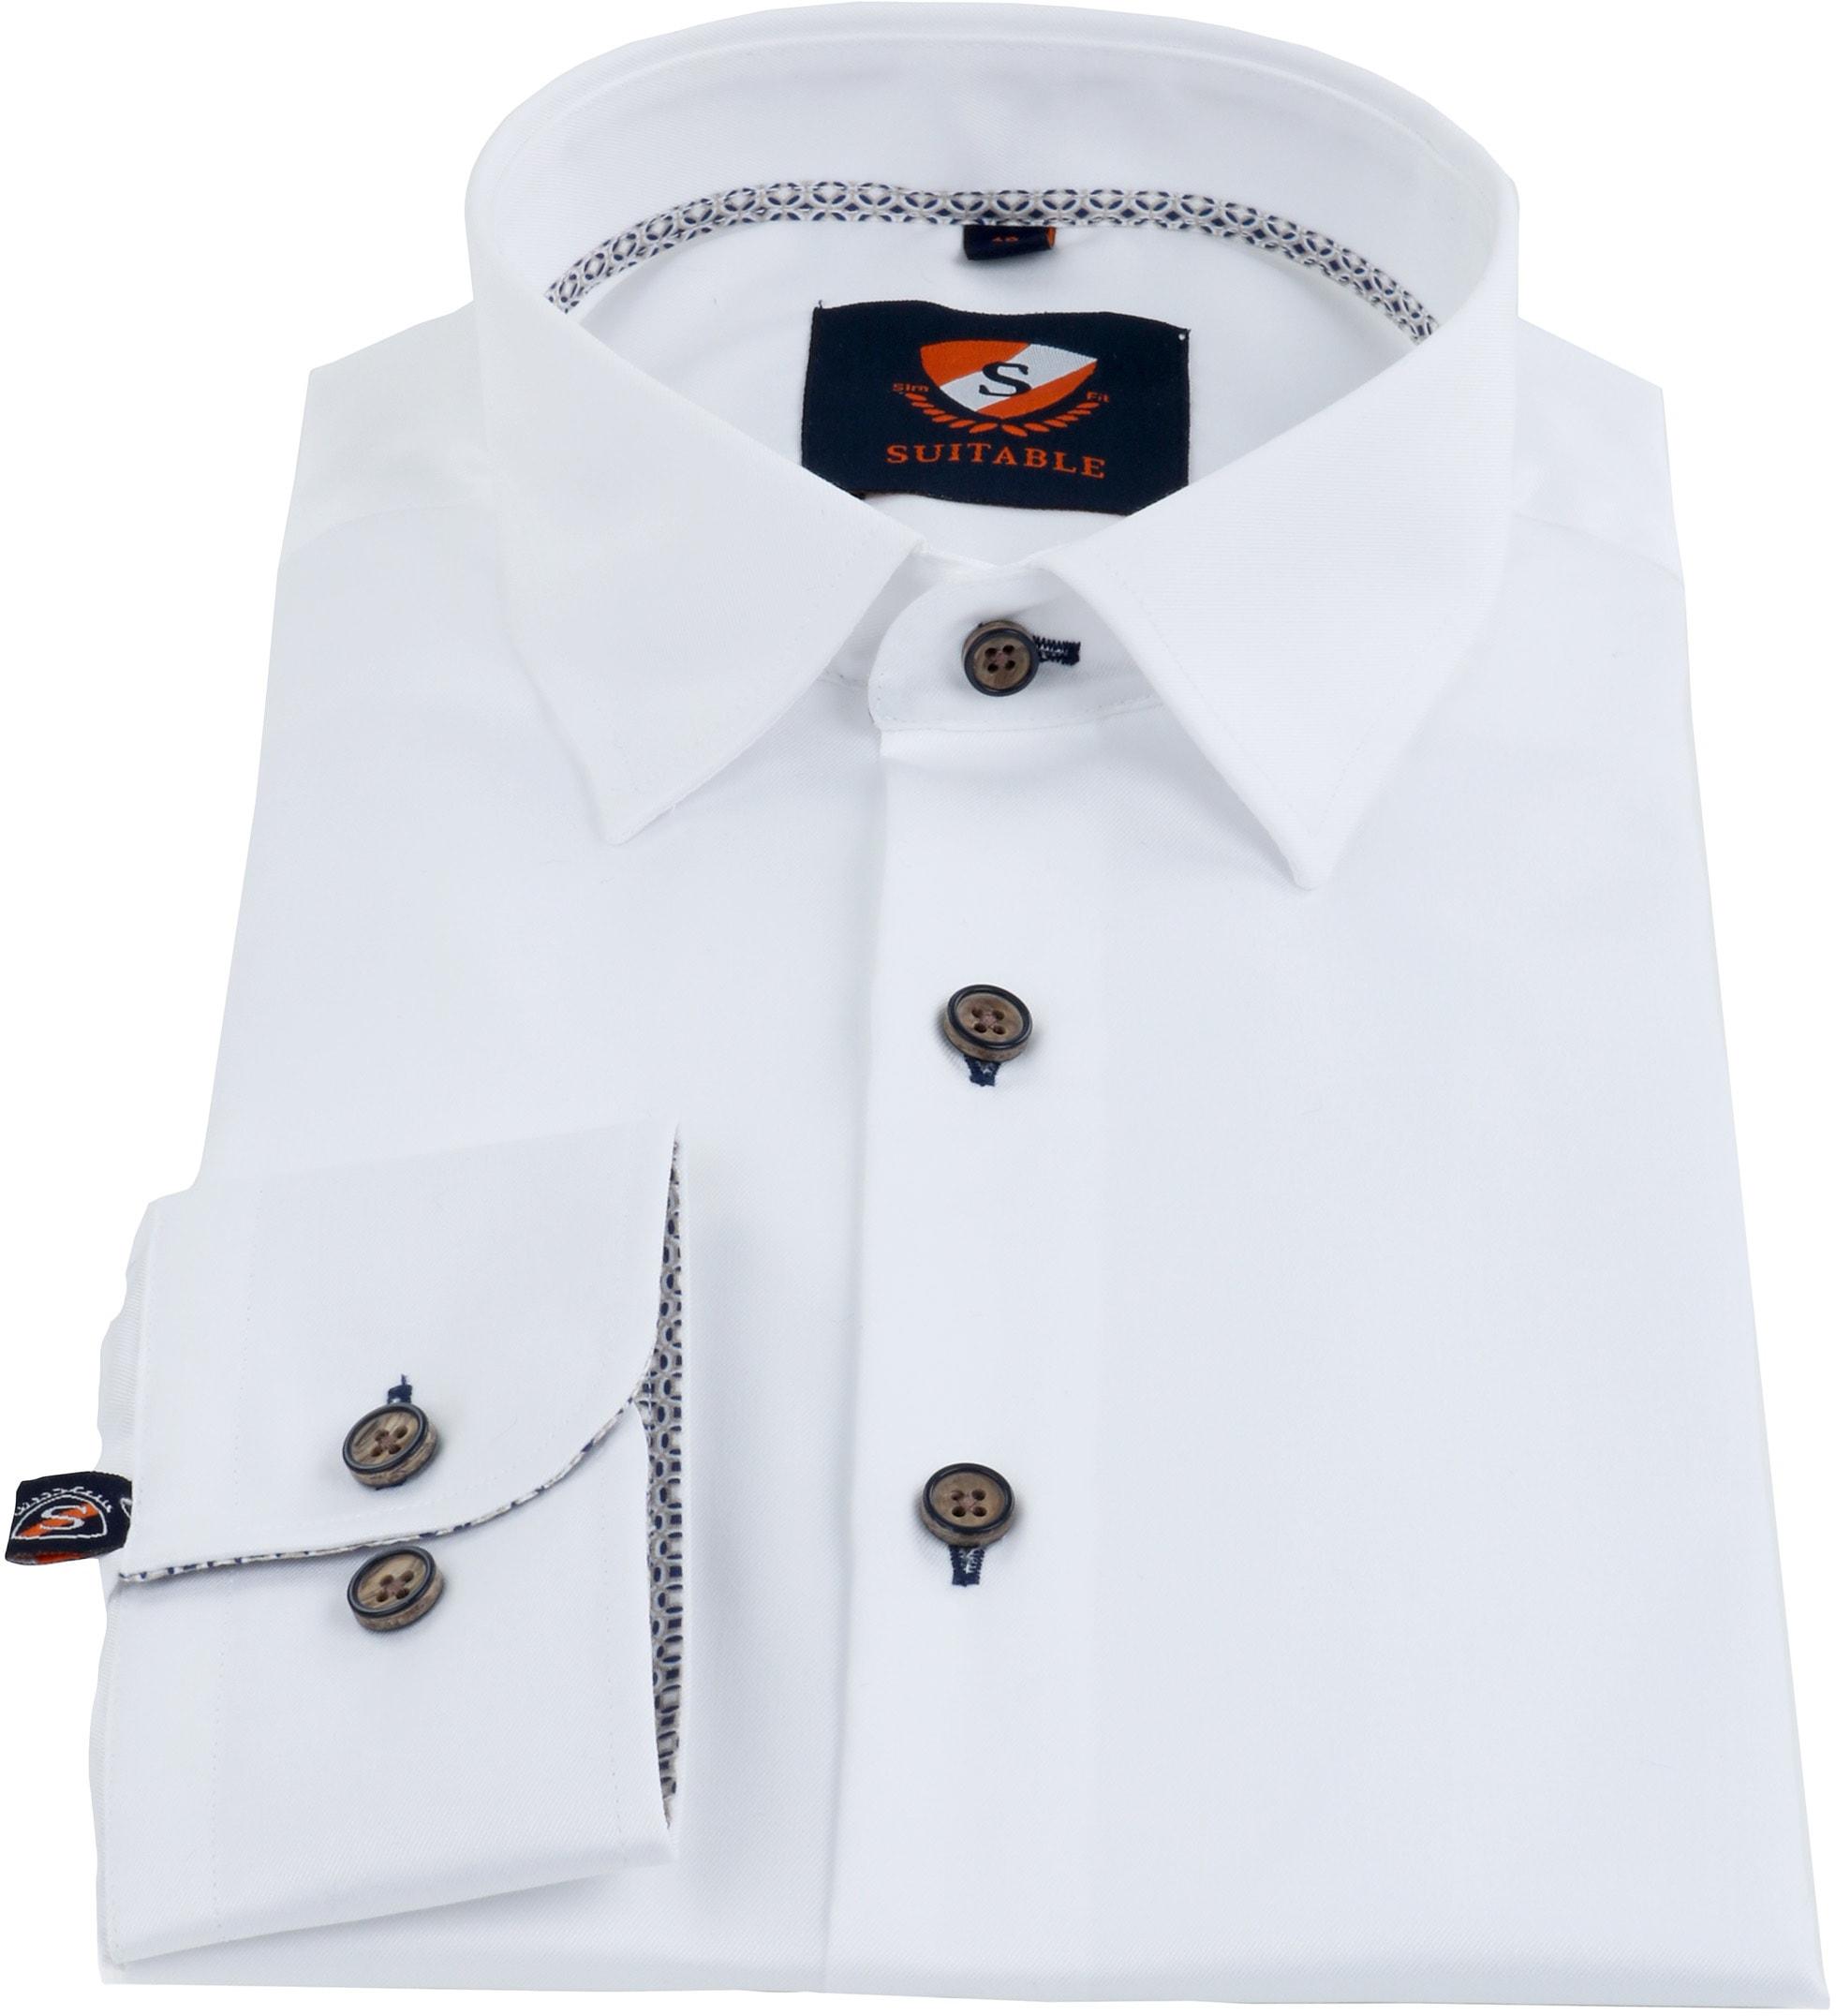 Suitable Overhemd Button Under Wit foto 2